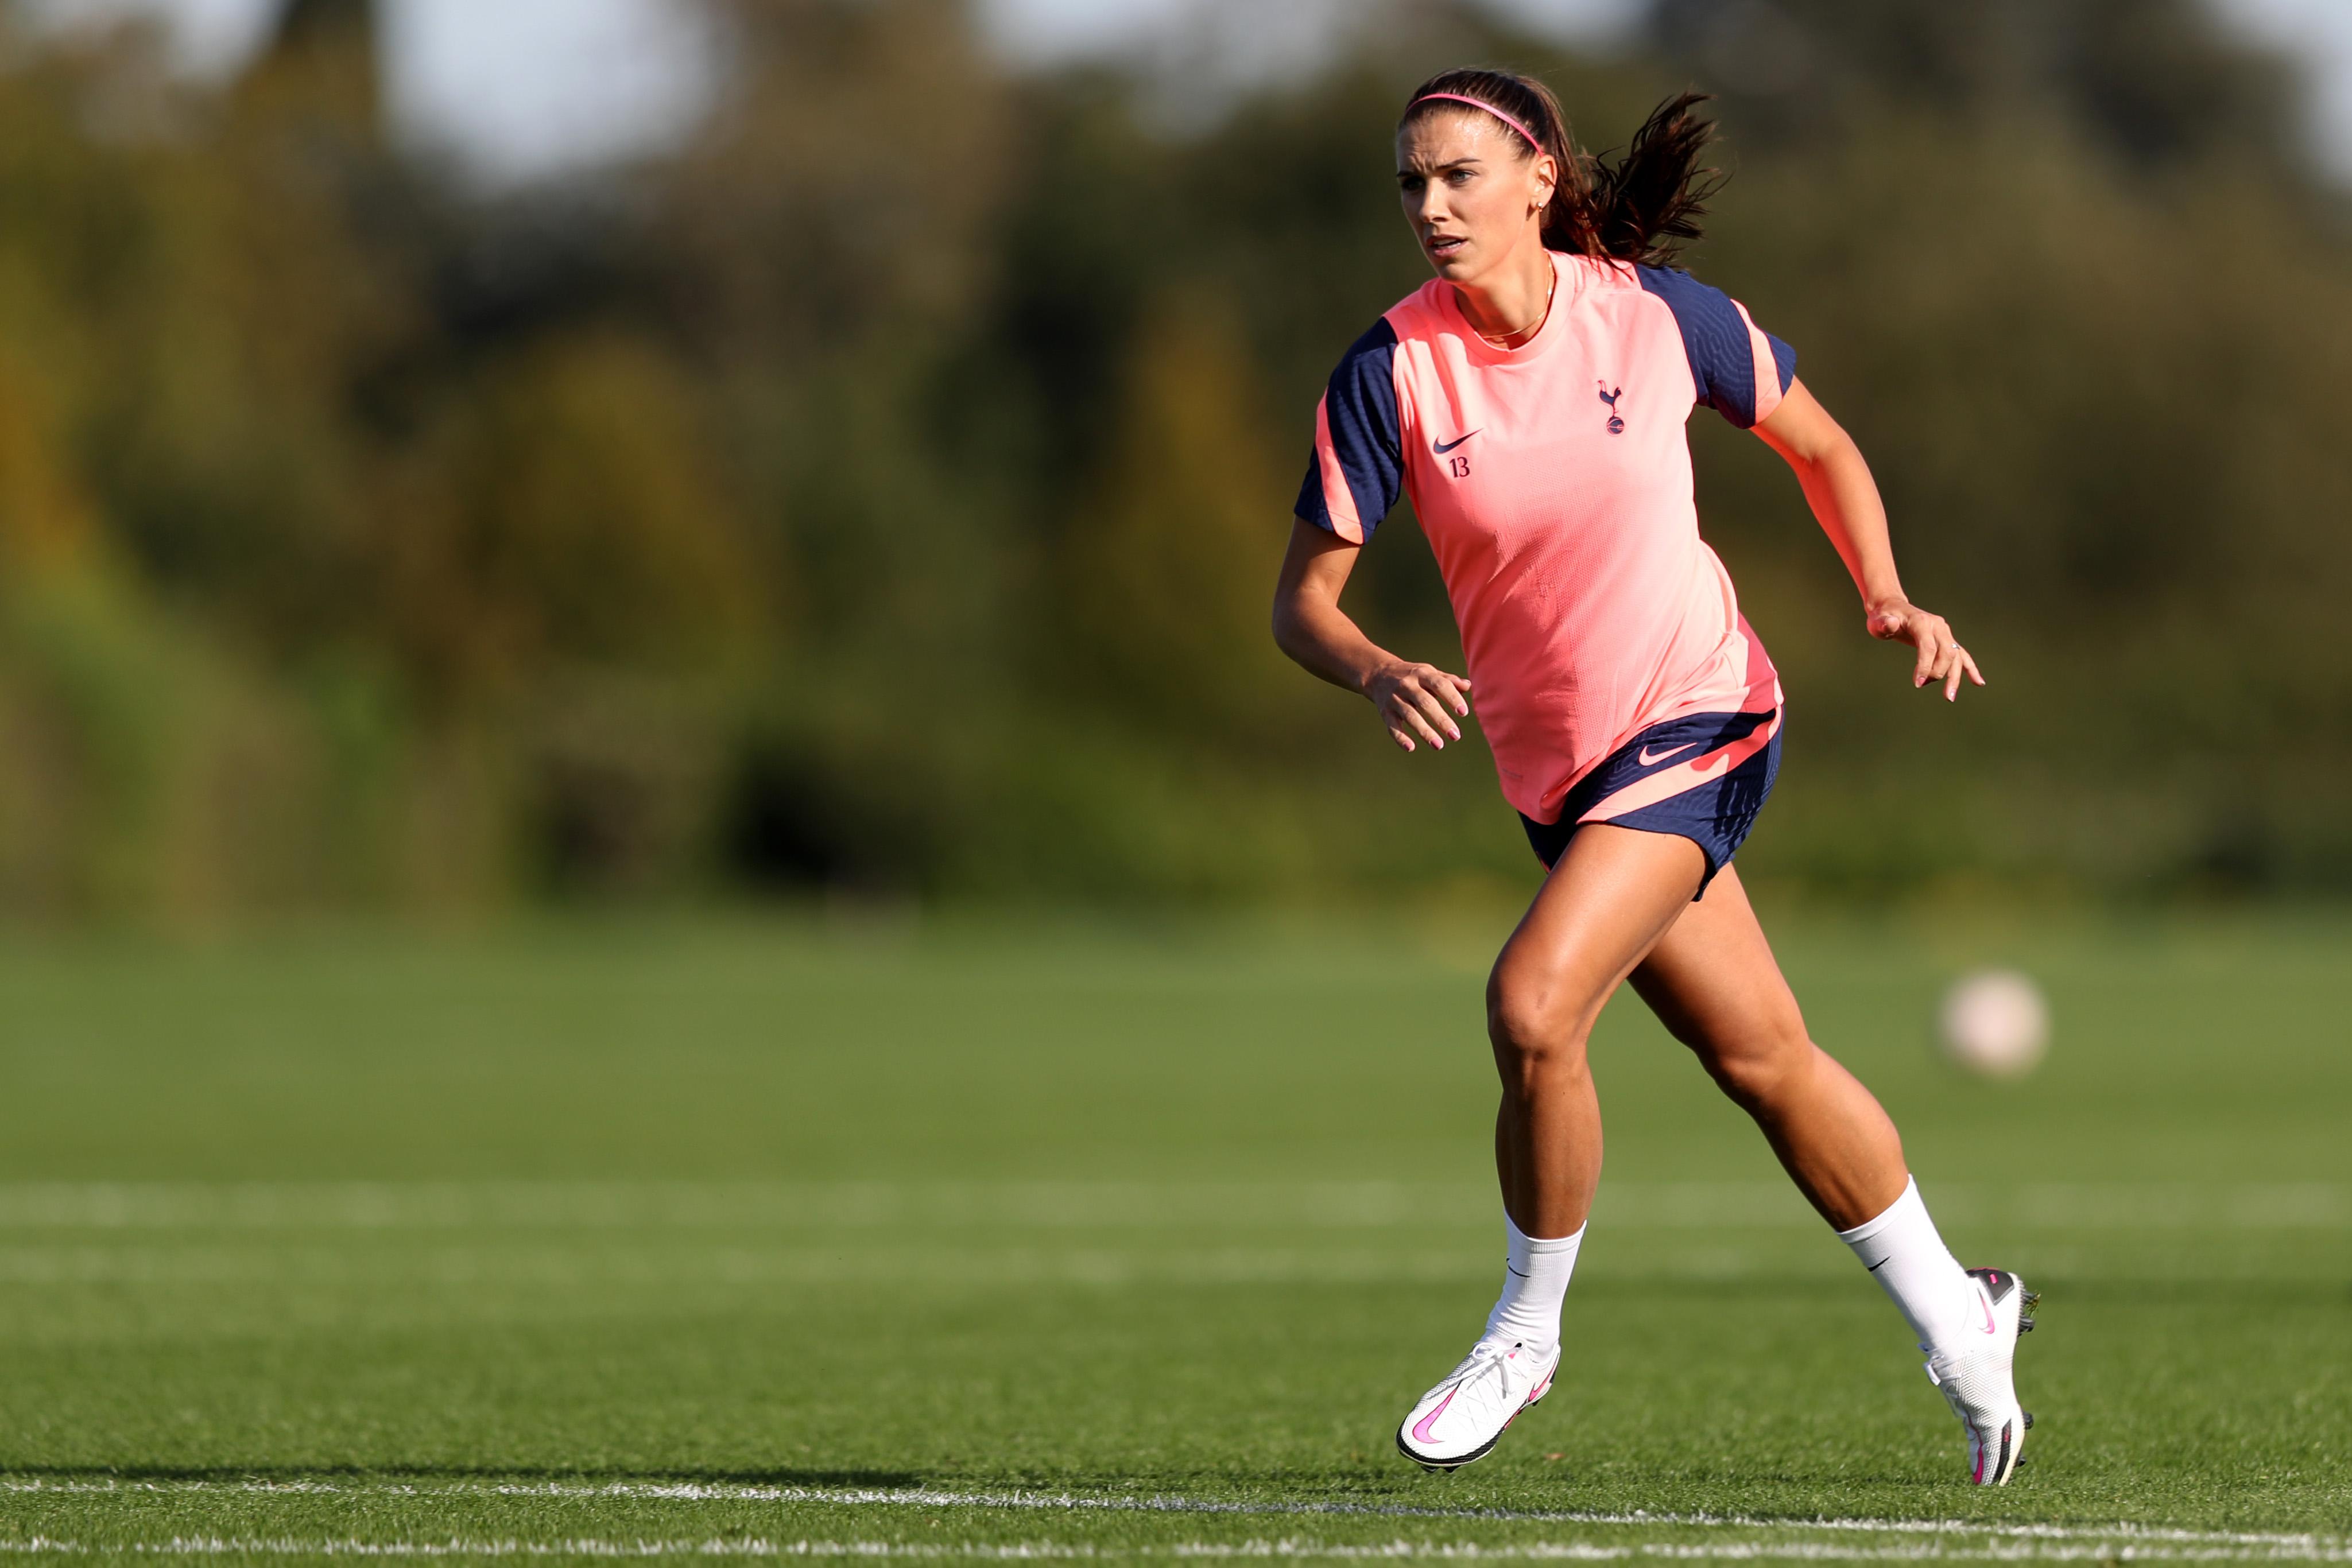 Alex Morgan has her First Day with Tottenham Hotspur Women